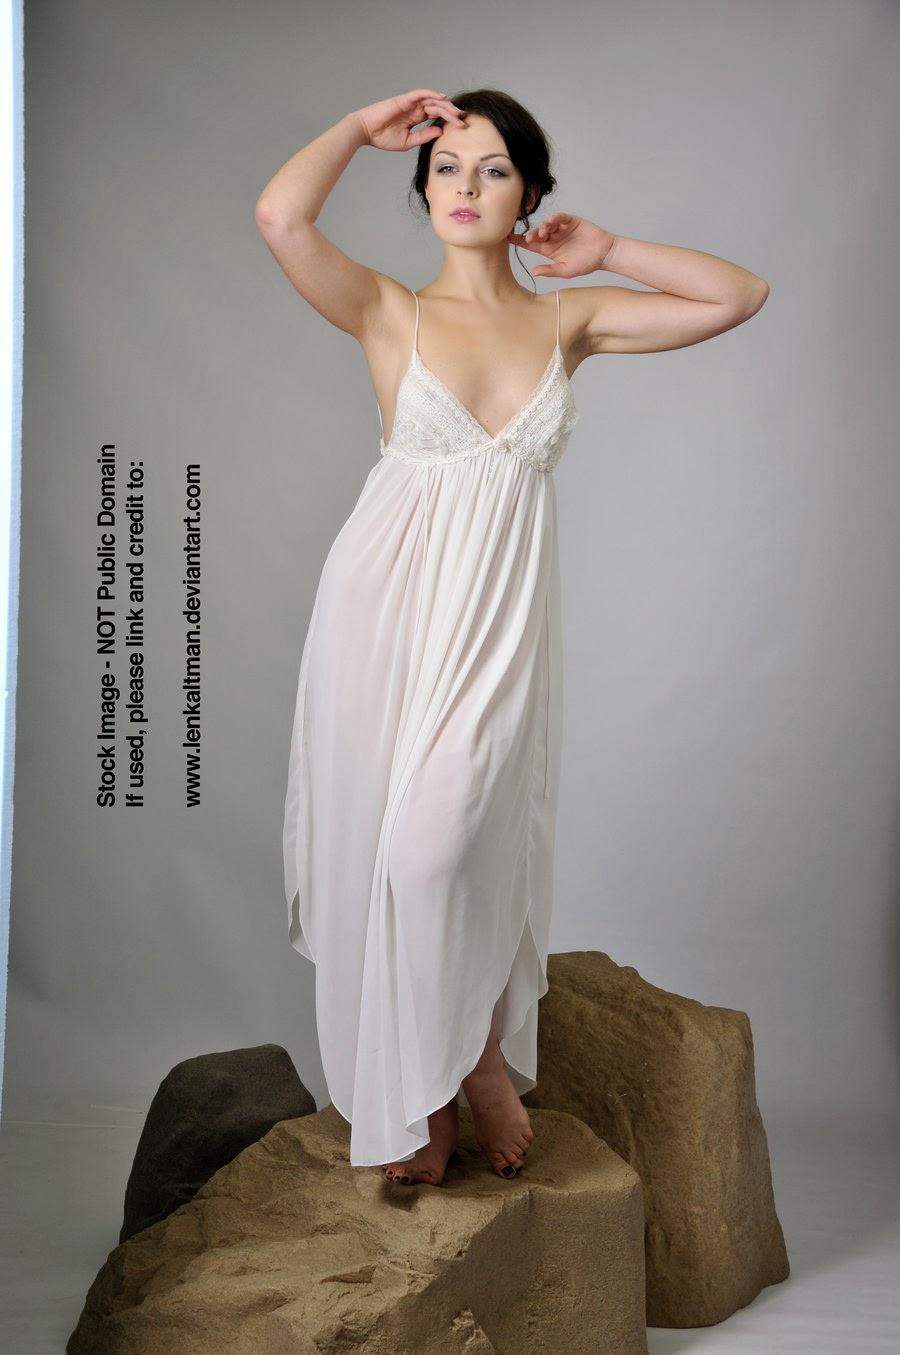 STOCK: Anastasia posing elegantly on rock (Standing)